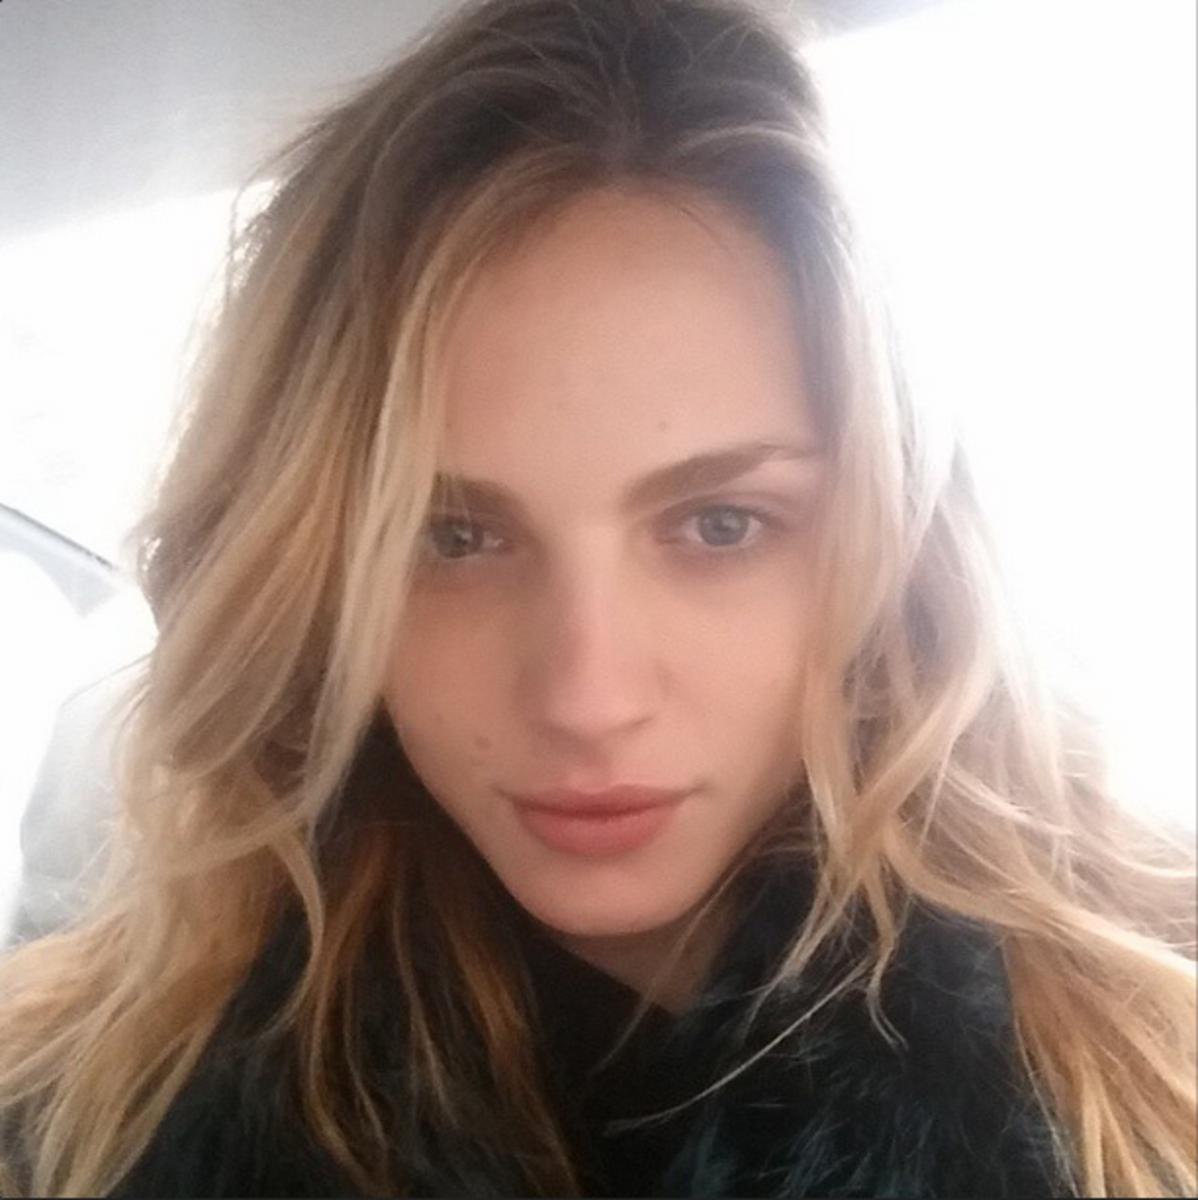 Andreja Pejic transgender model via Instagram